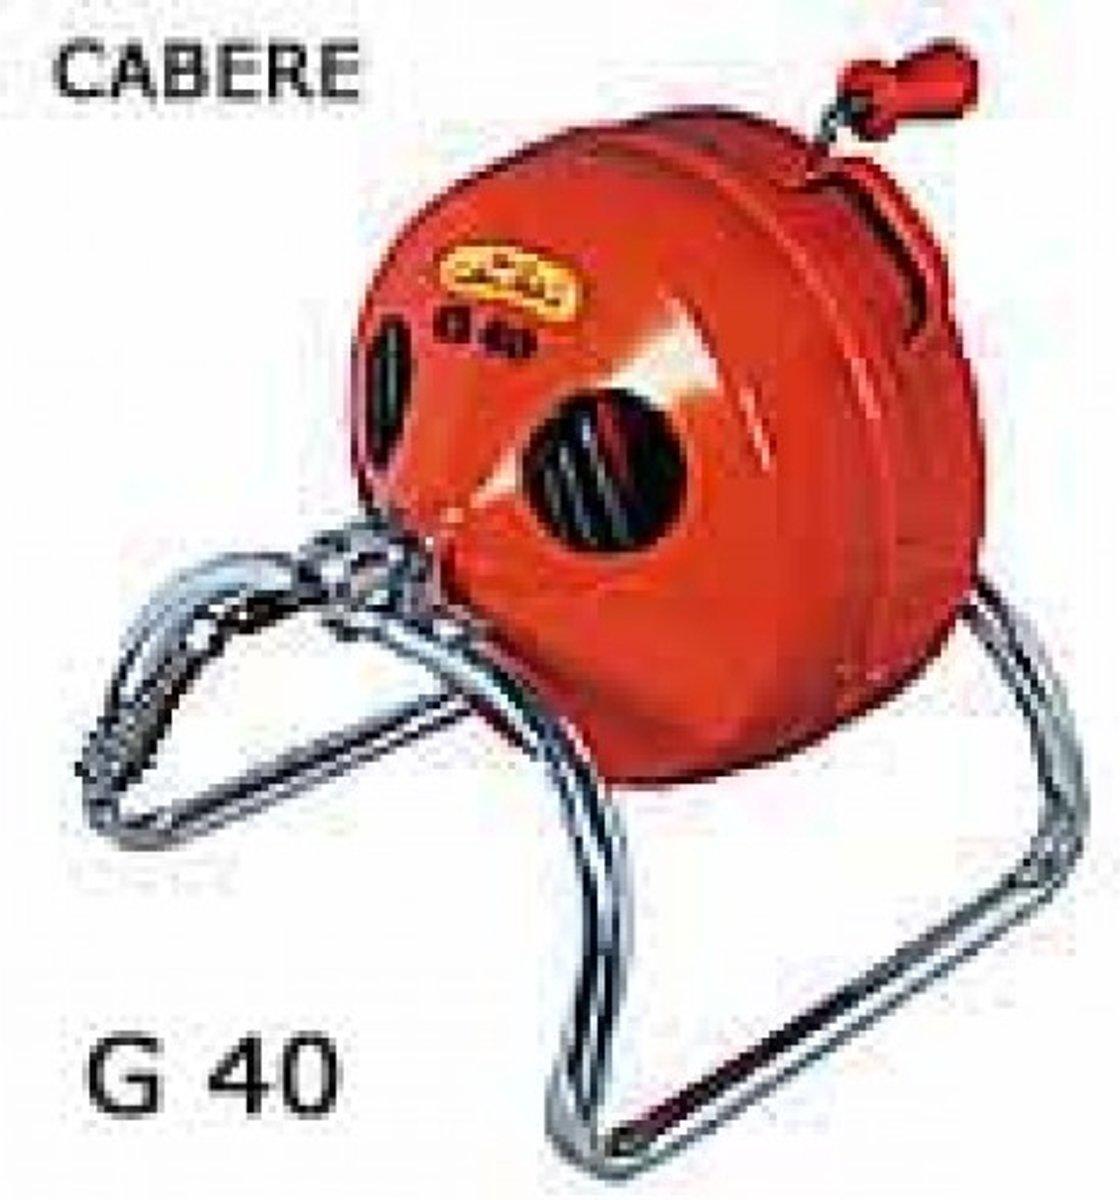 Cabere G40 Kogelgelagerde ontstopper - ontstoppingsveer kopen